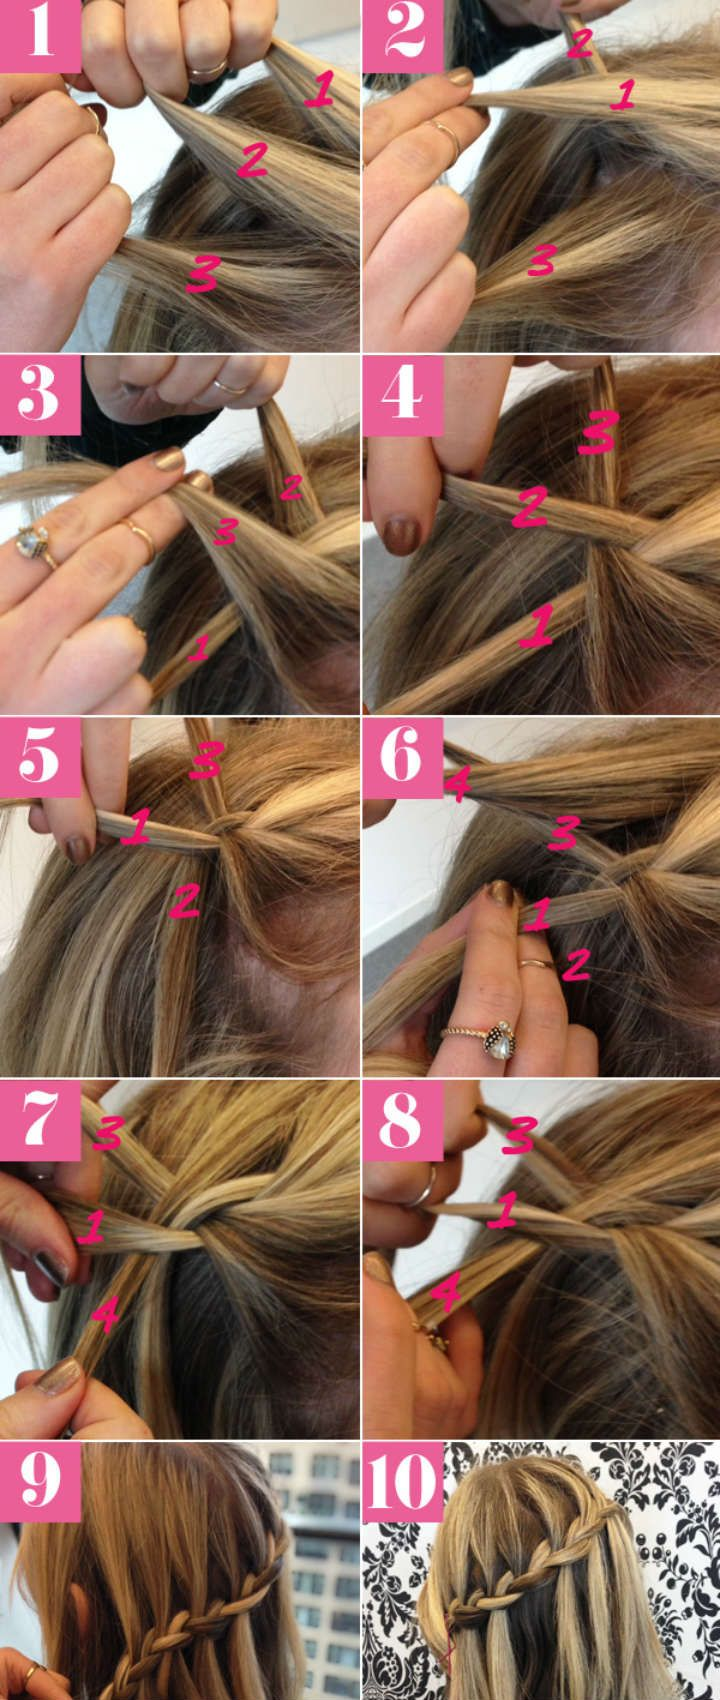 Diez pasos para éste peinado..